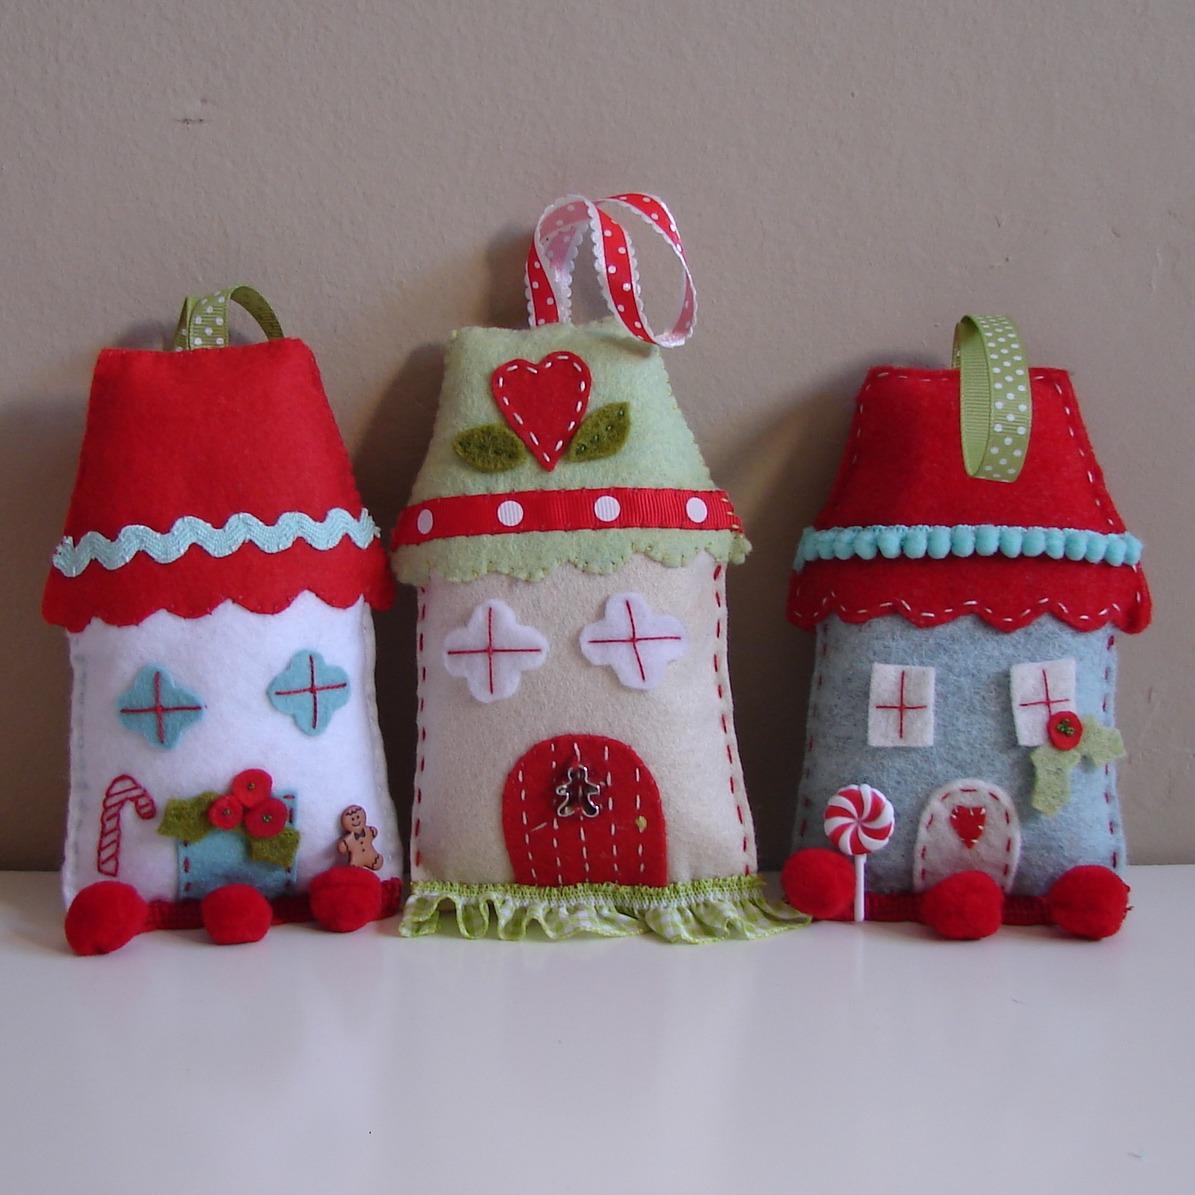 Roxy creations october 2010